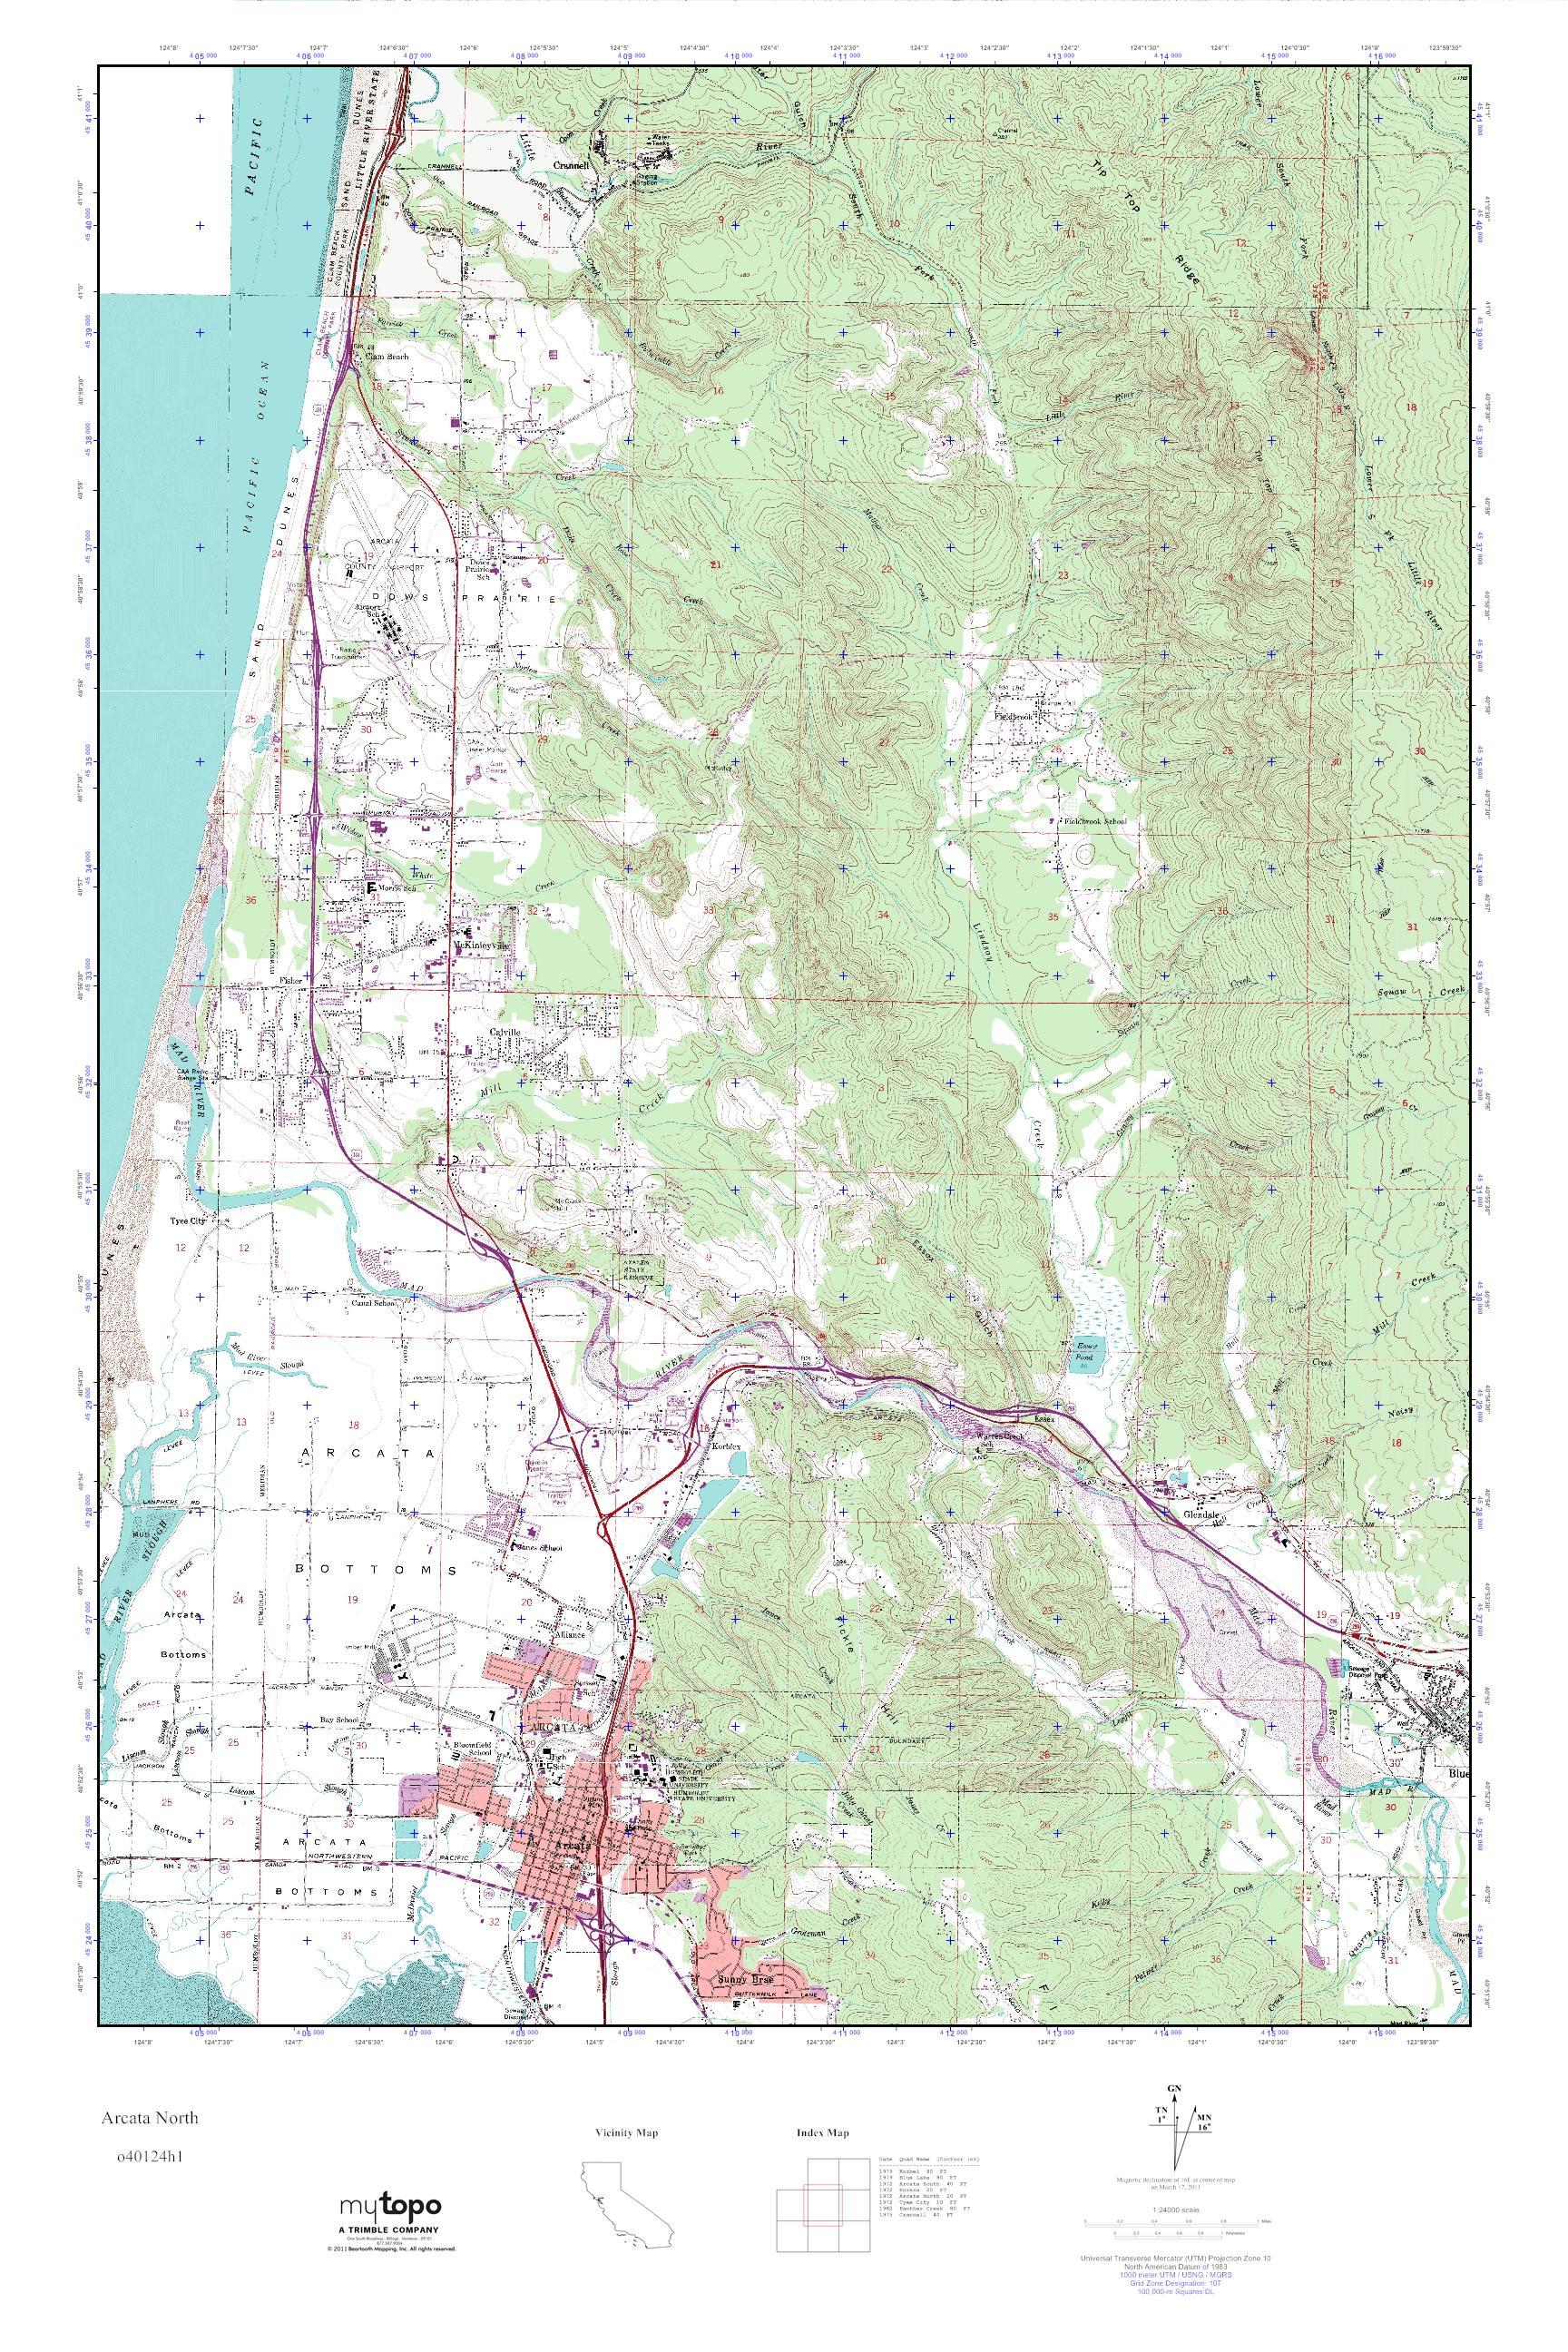 MyTopo Arcata North California USGS Quad Topo Map